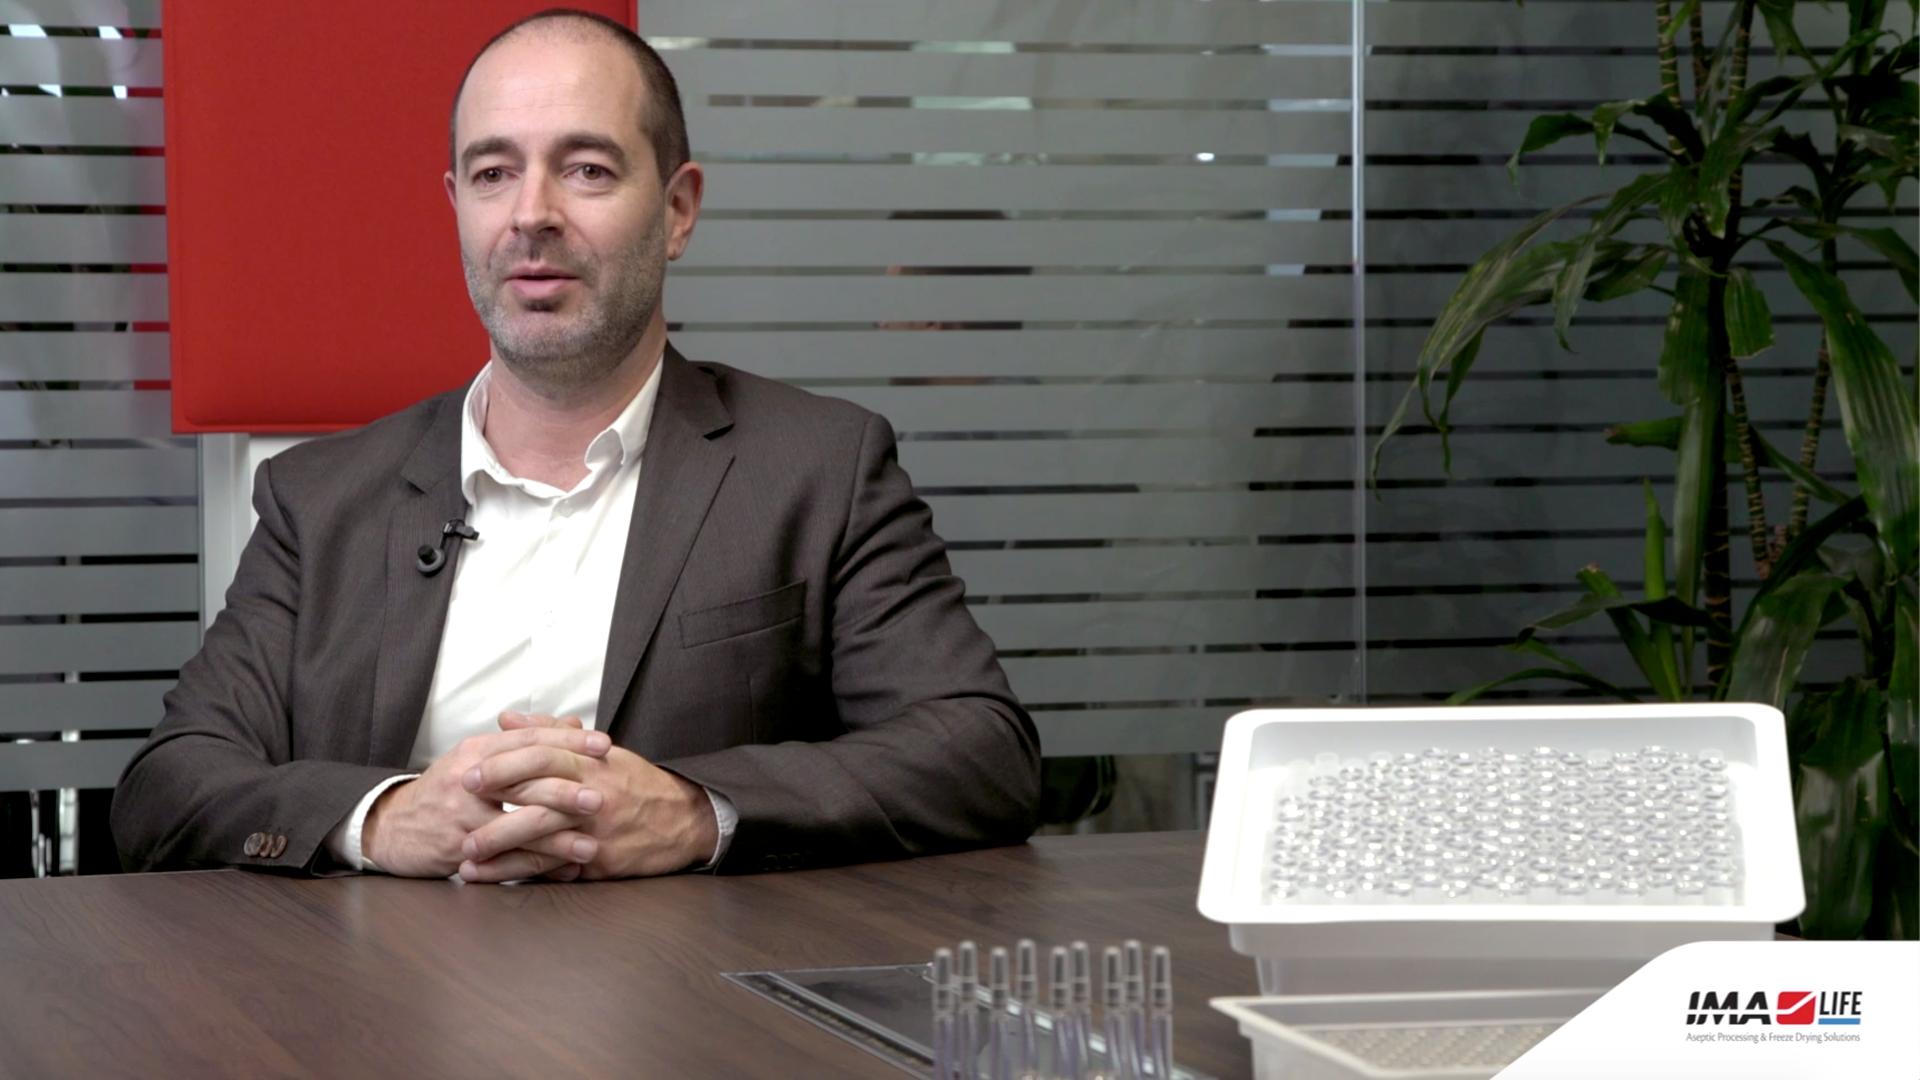 Watch the video interview with Alberto Penati